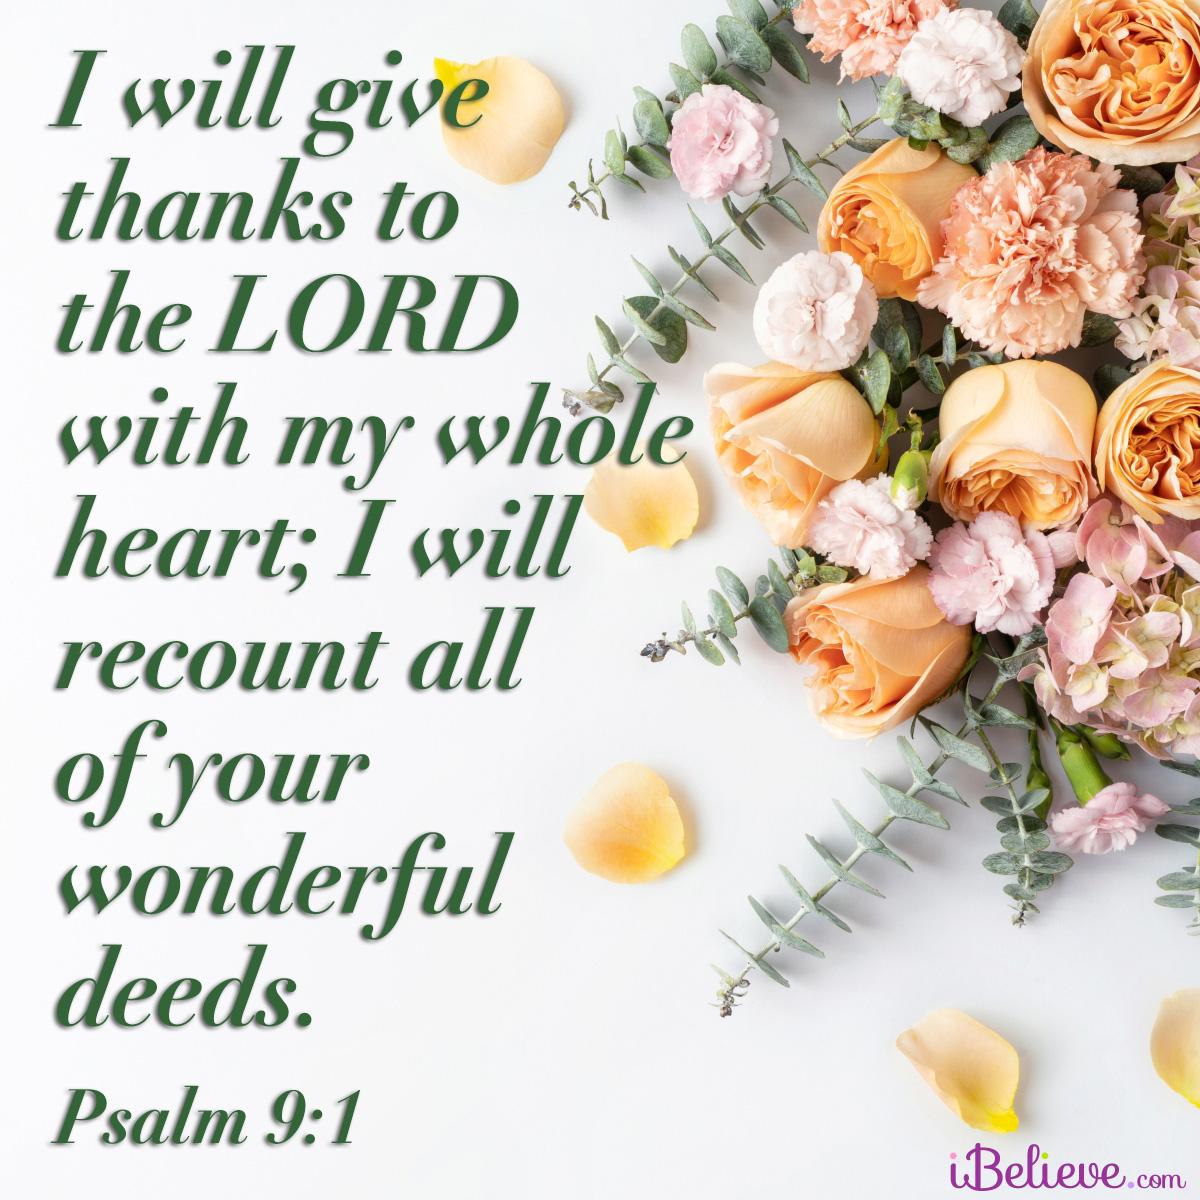 Psalm 9:1, inspirational image